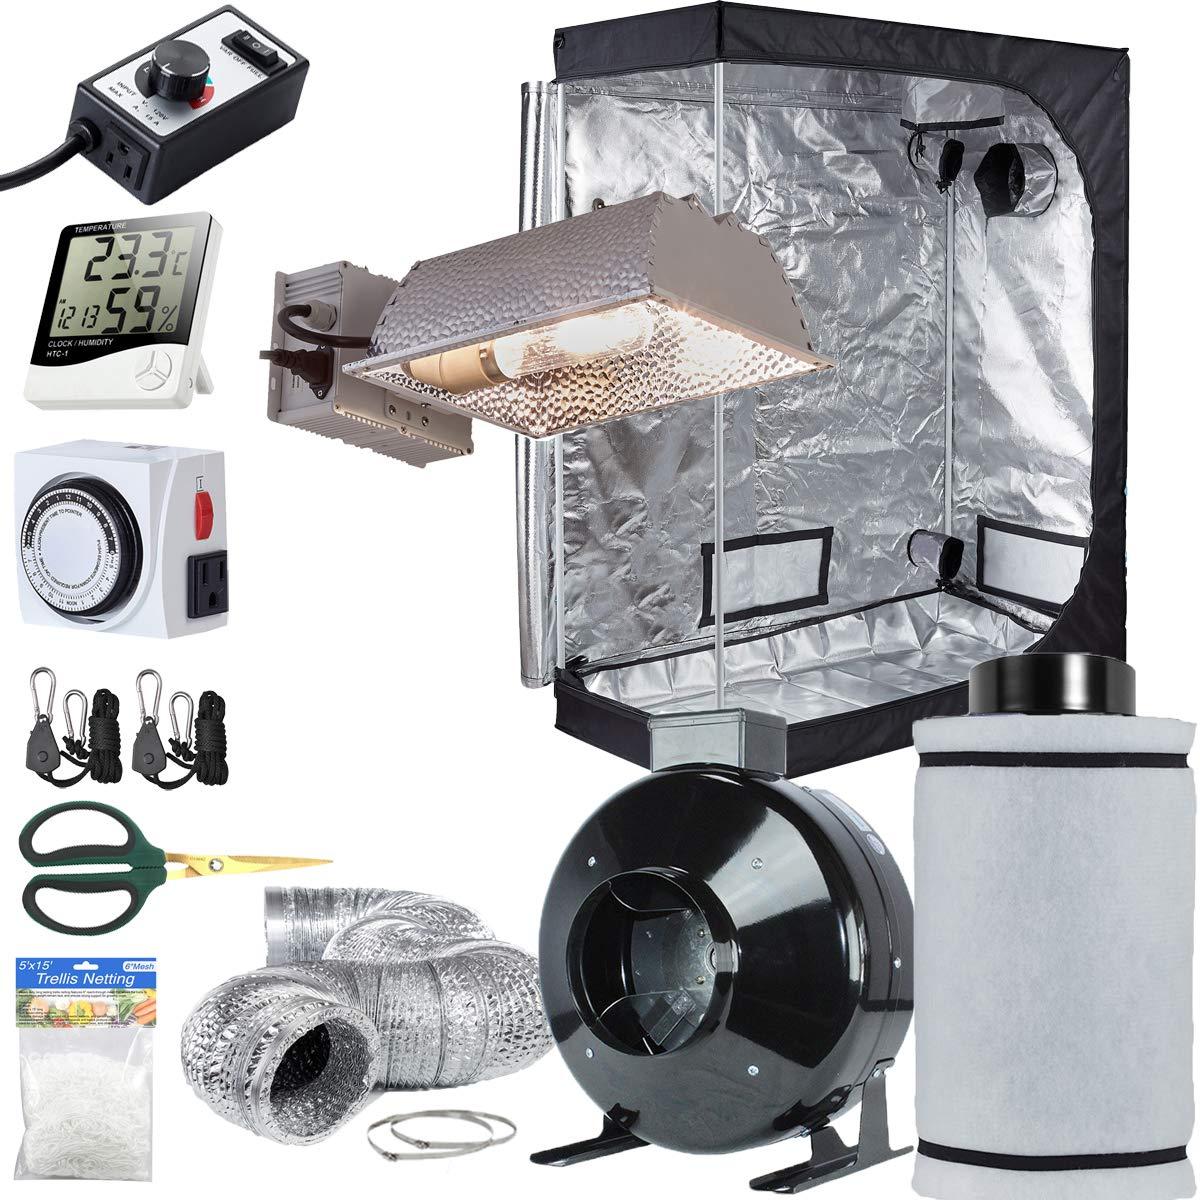 TopoLite Grow Tent Setup Complete Kit CMH 315W Enclosed Grow Light + 6'' Filter Fan Kit + 48''x24''x60'' Dark Room + Hydroponic Indoor Plants Growing System Accessories (48''x24''x60'' Kit)